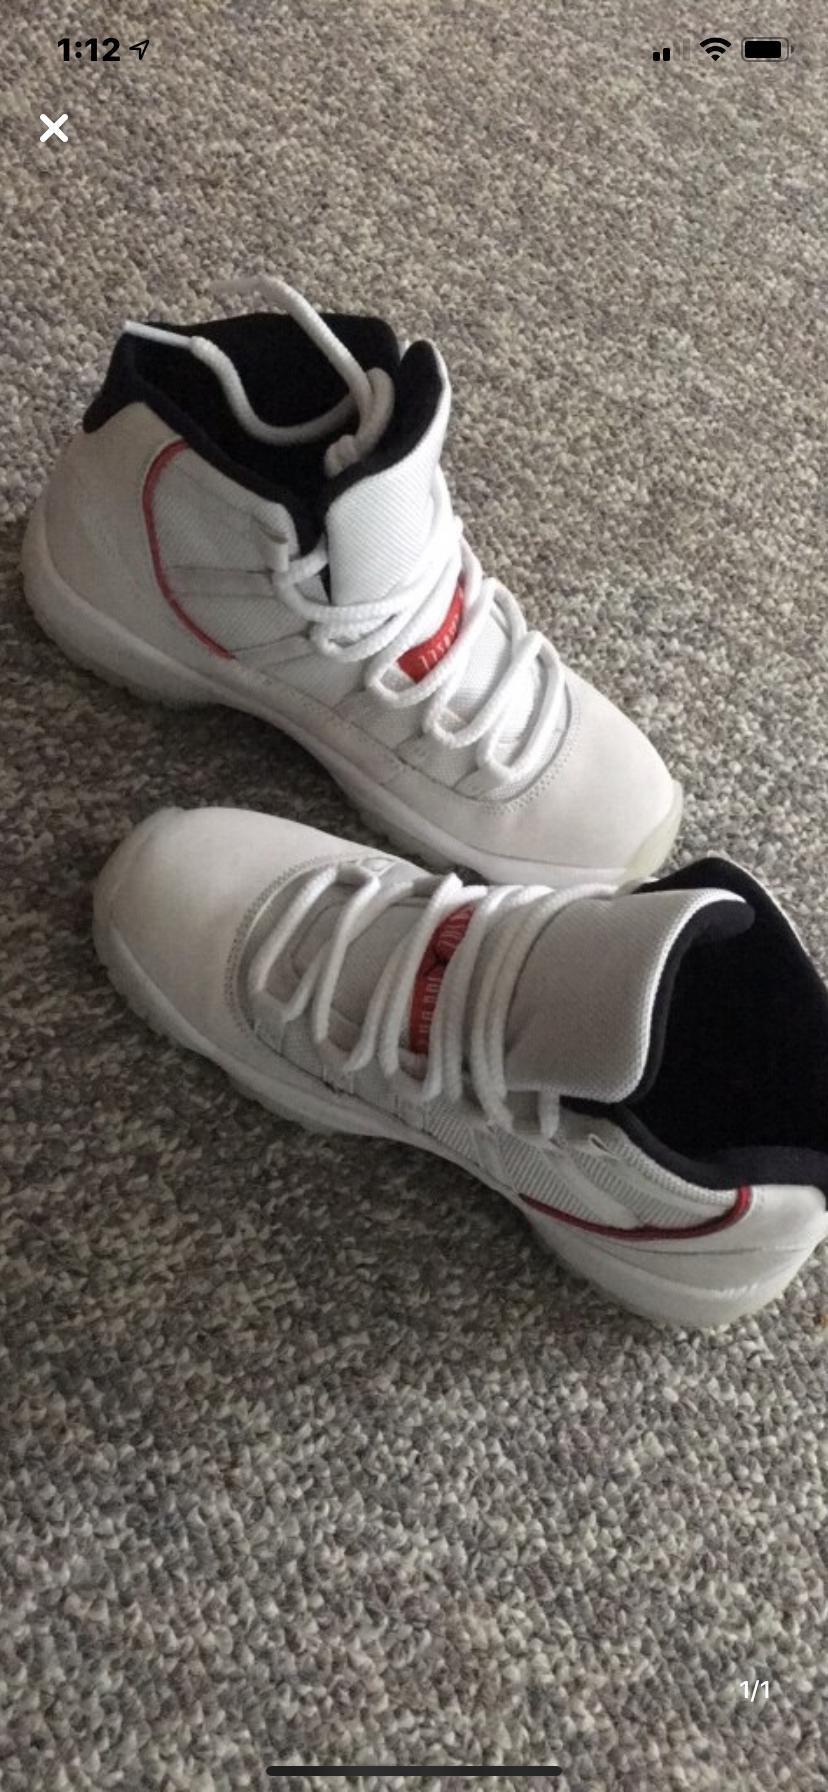 Air Jordan - $220 - Size 4.5